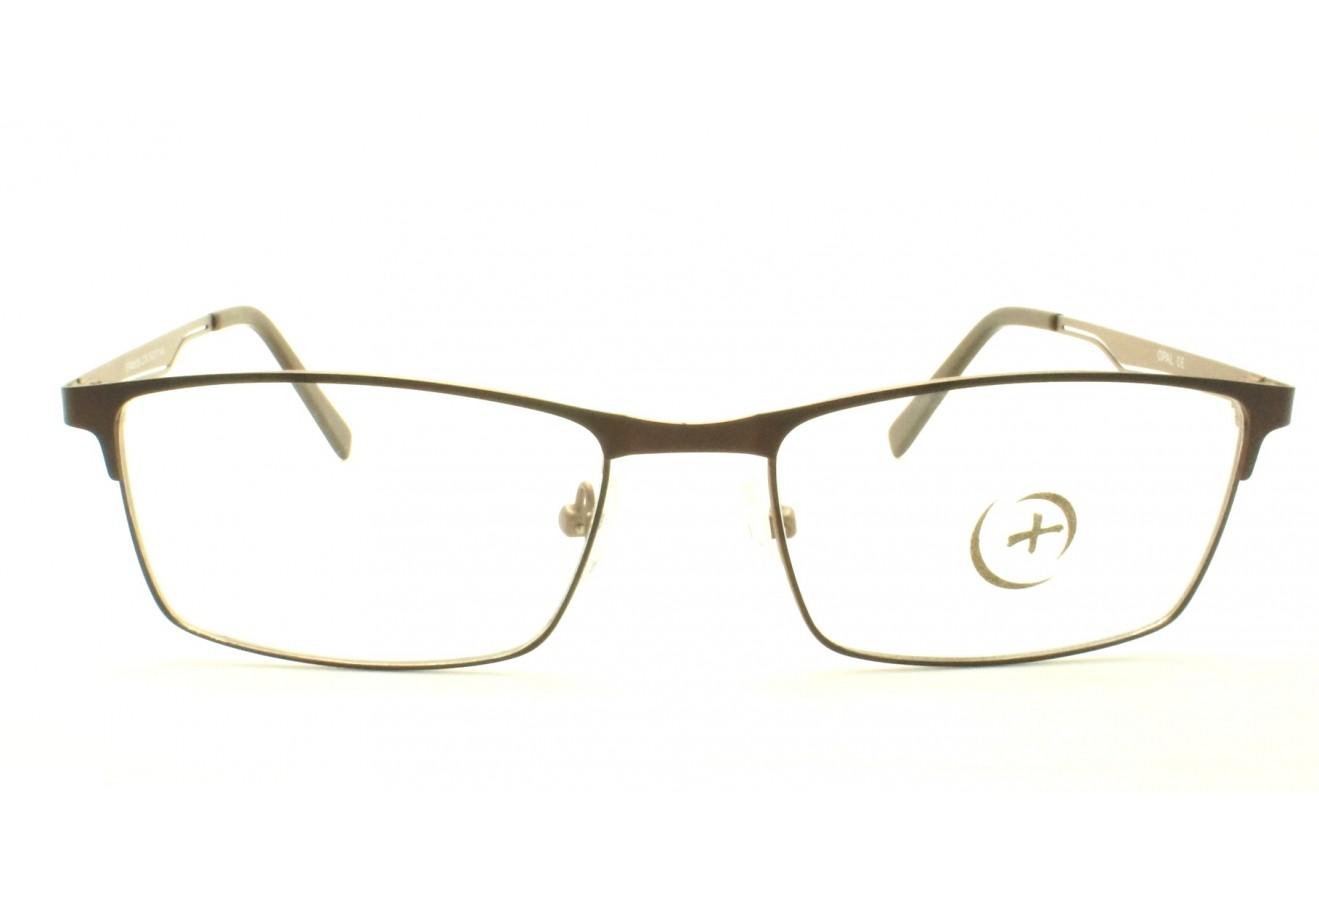 lunettes de vue mymonture opmm 130 c16 54 17. Black Bedroom Furniture Sets. Home Design Ideas